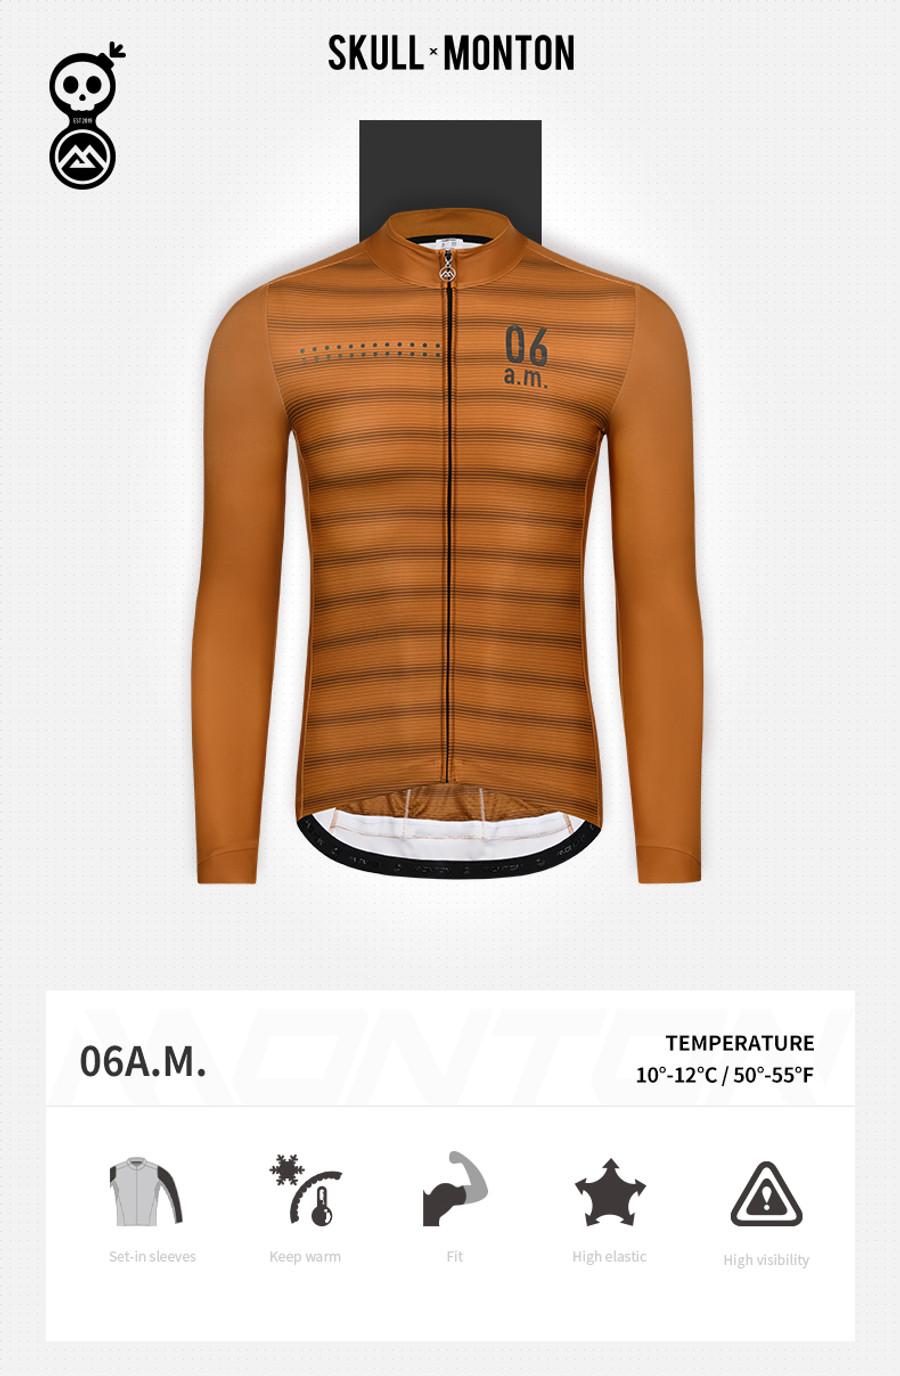 Men's Urban+ 6 a.m. Thermal l/s Jersey